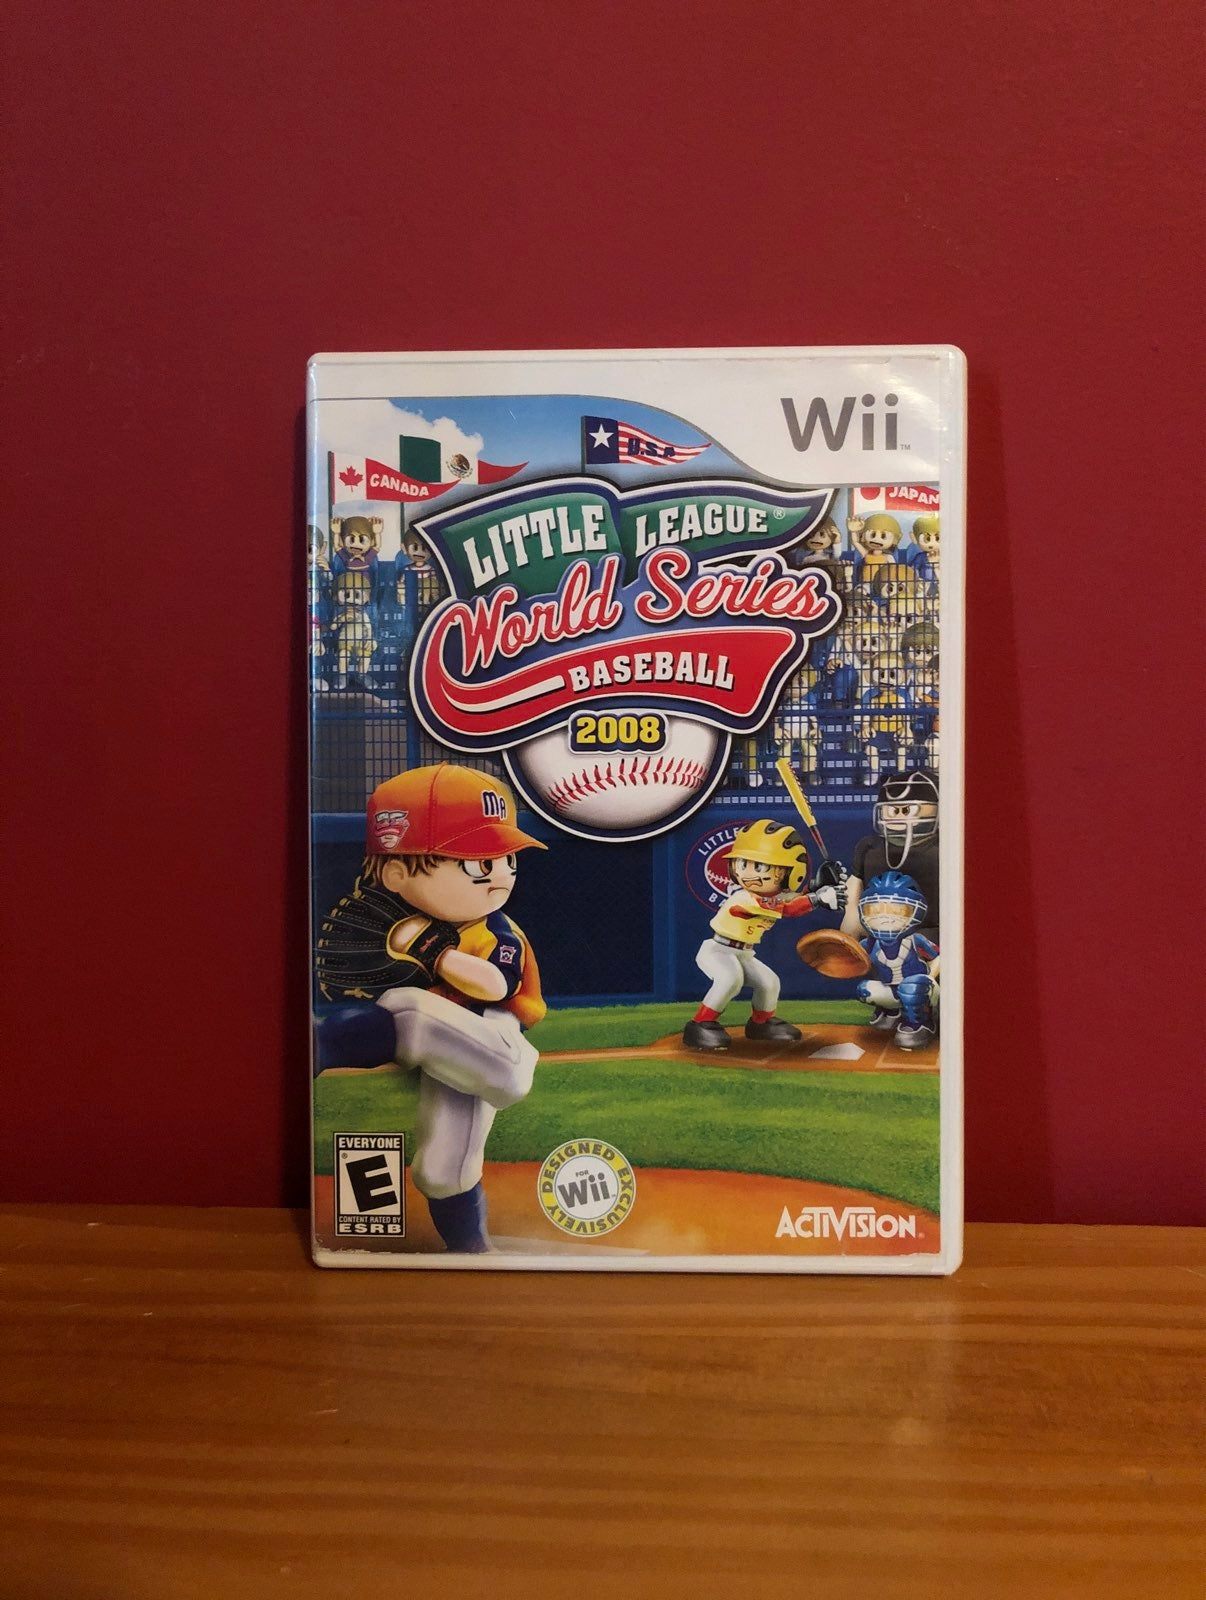 LL World Series Baseball Wii game